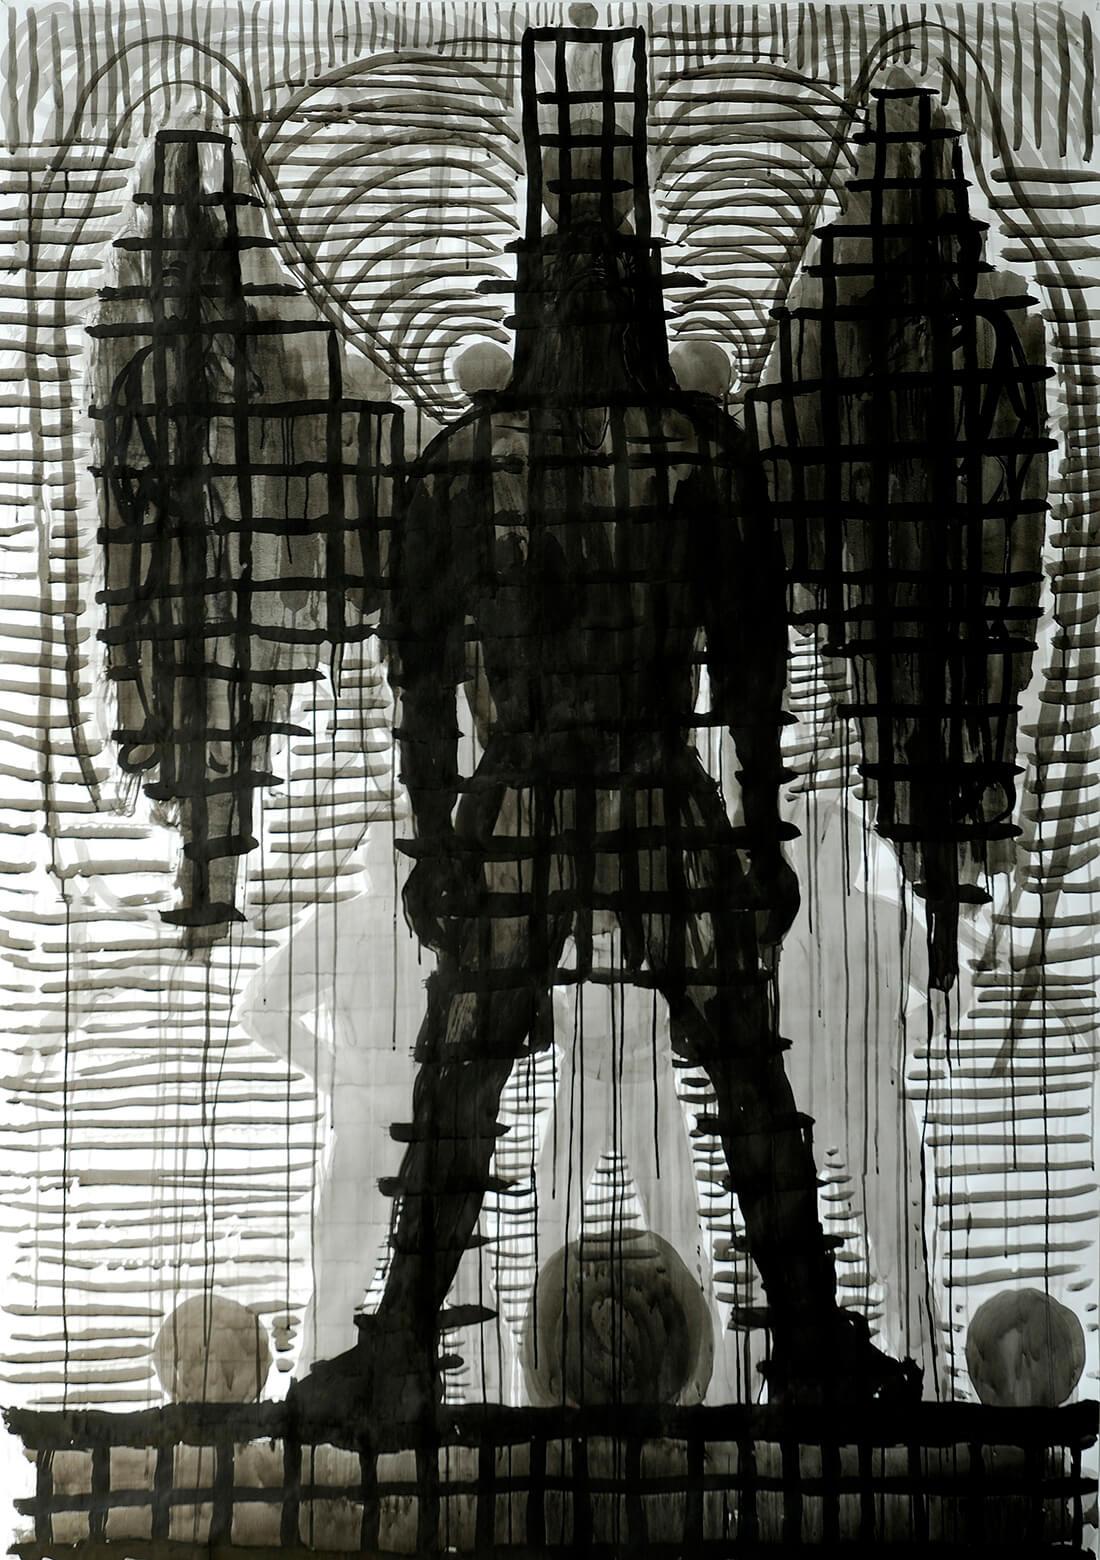 untitled (black angel), 210 x 130 cm, ink on paper, 2007